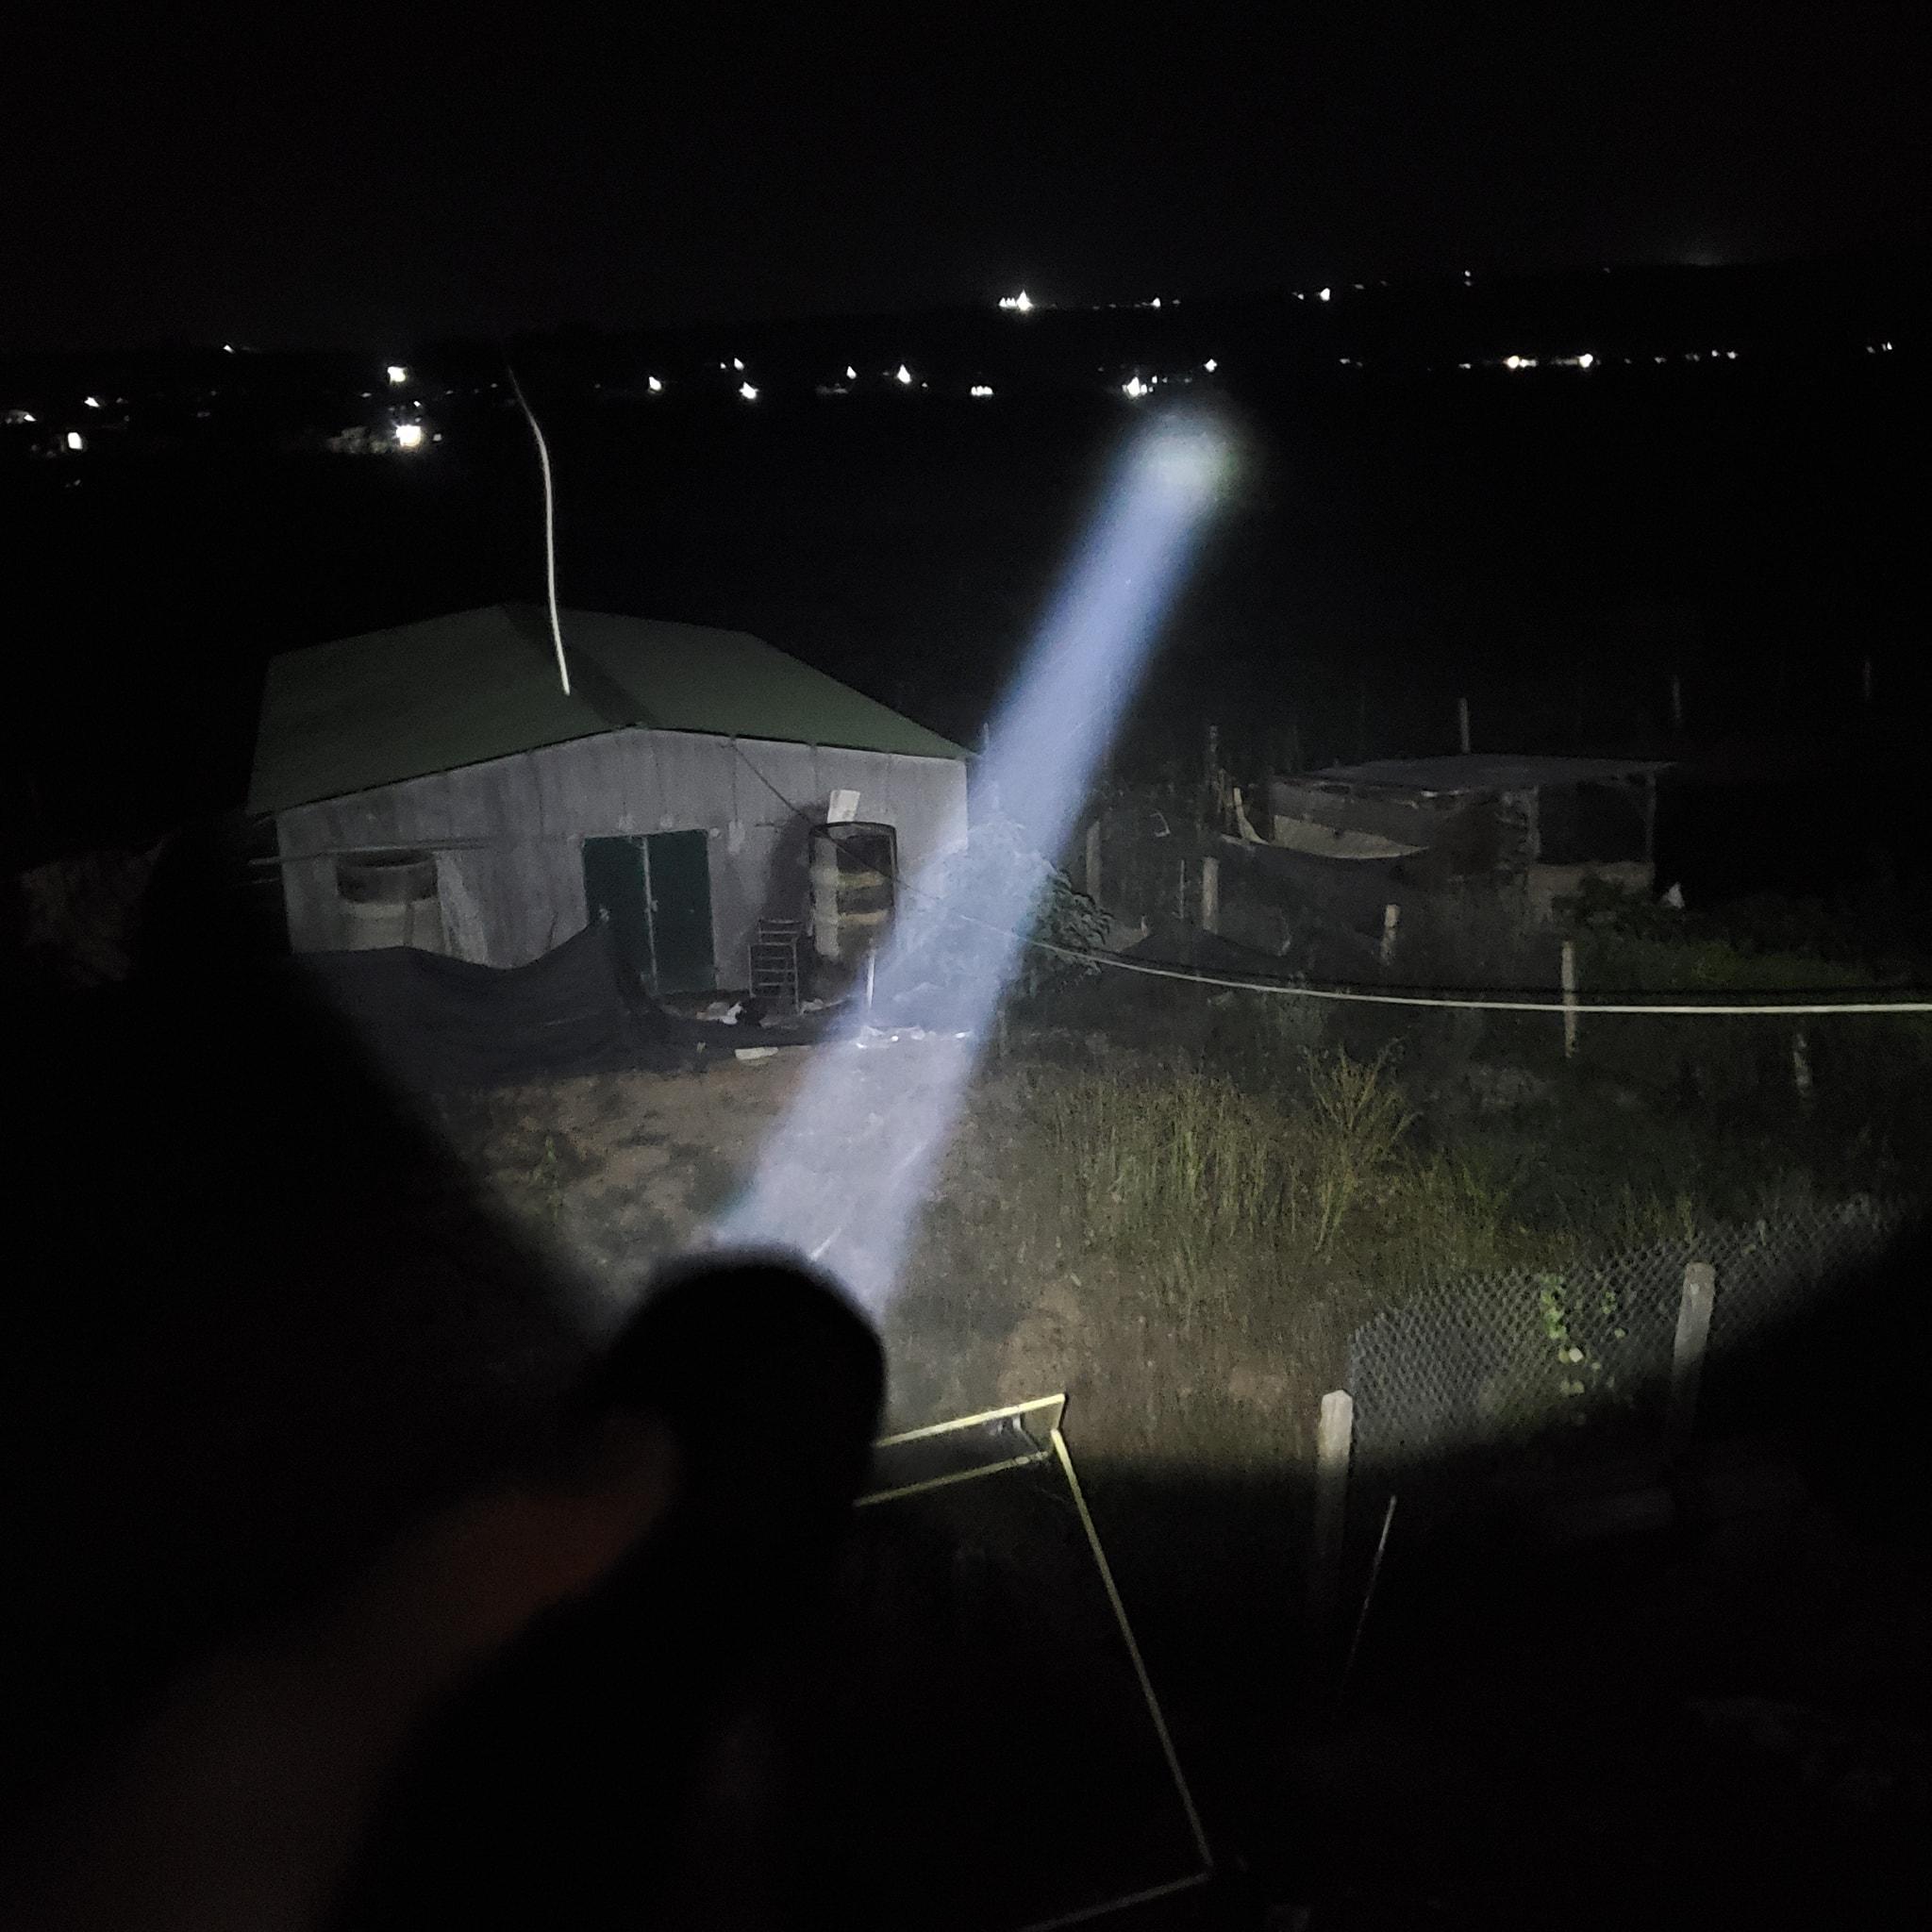 Đèn pin Wainlight C8S OSRAM 3030 1mm beam 1km